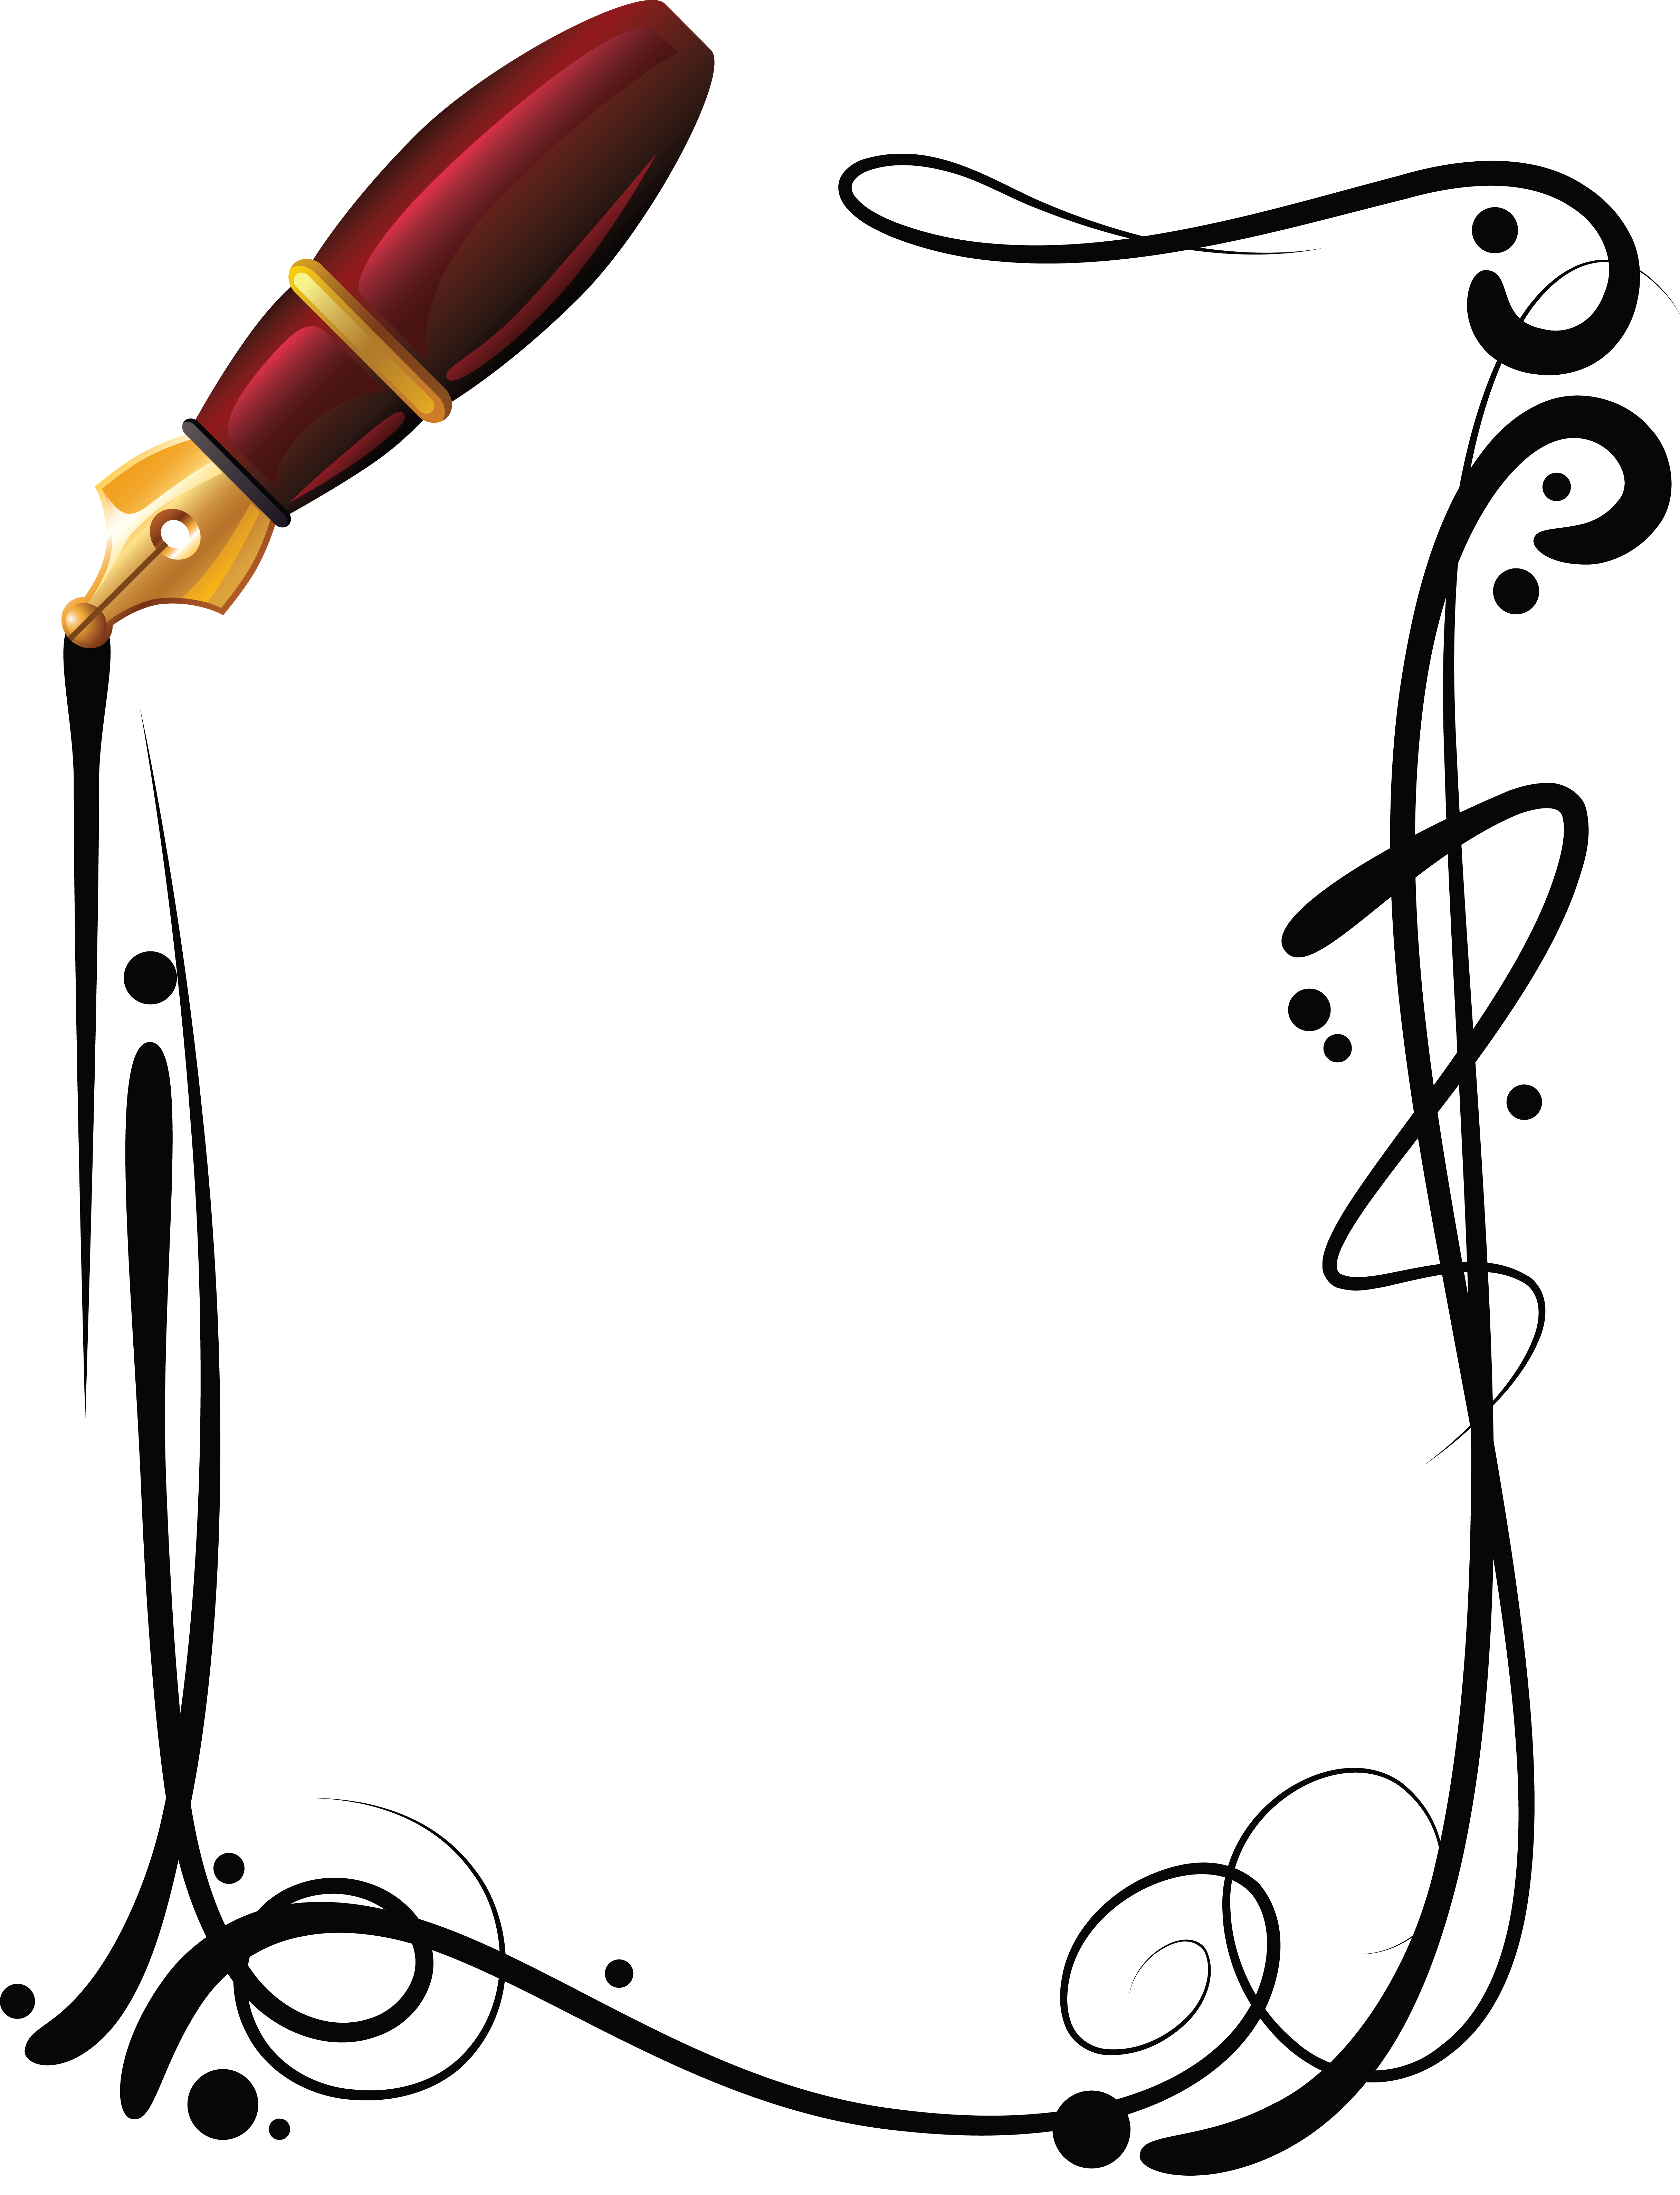 F:\Документы\Фоны оформление\фото рамки\рамка ручка.png